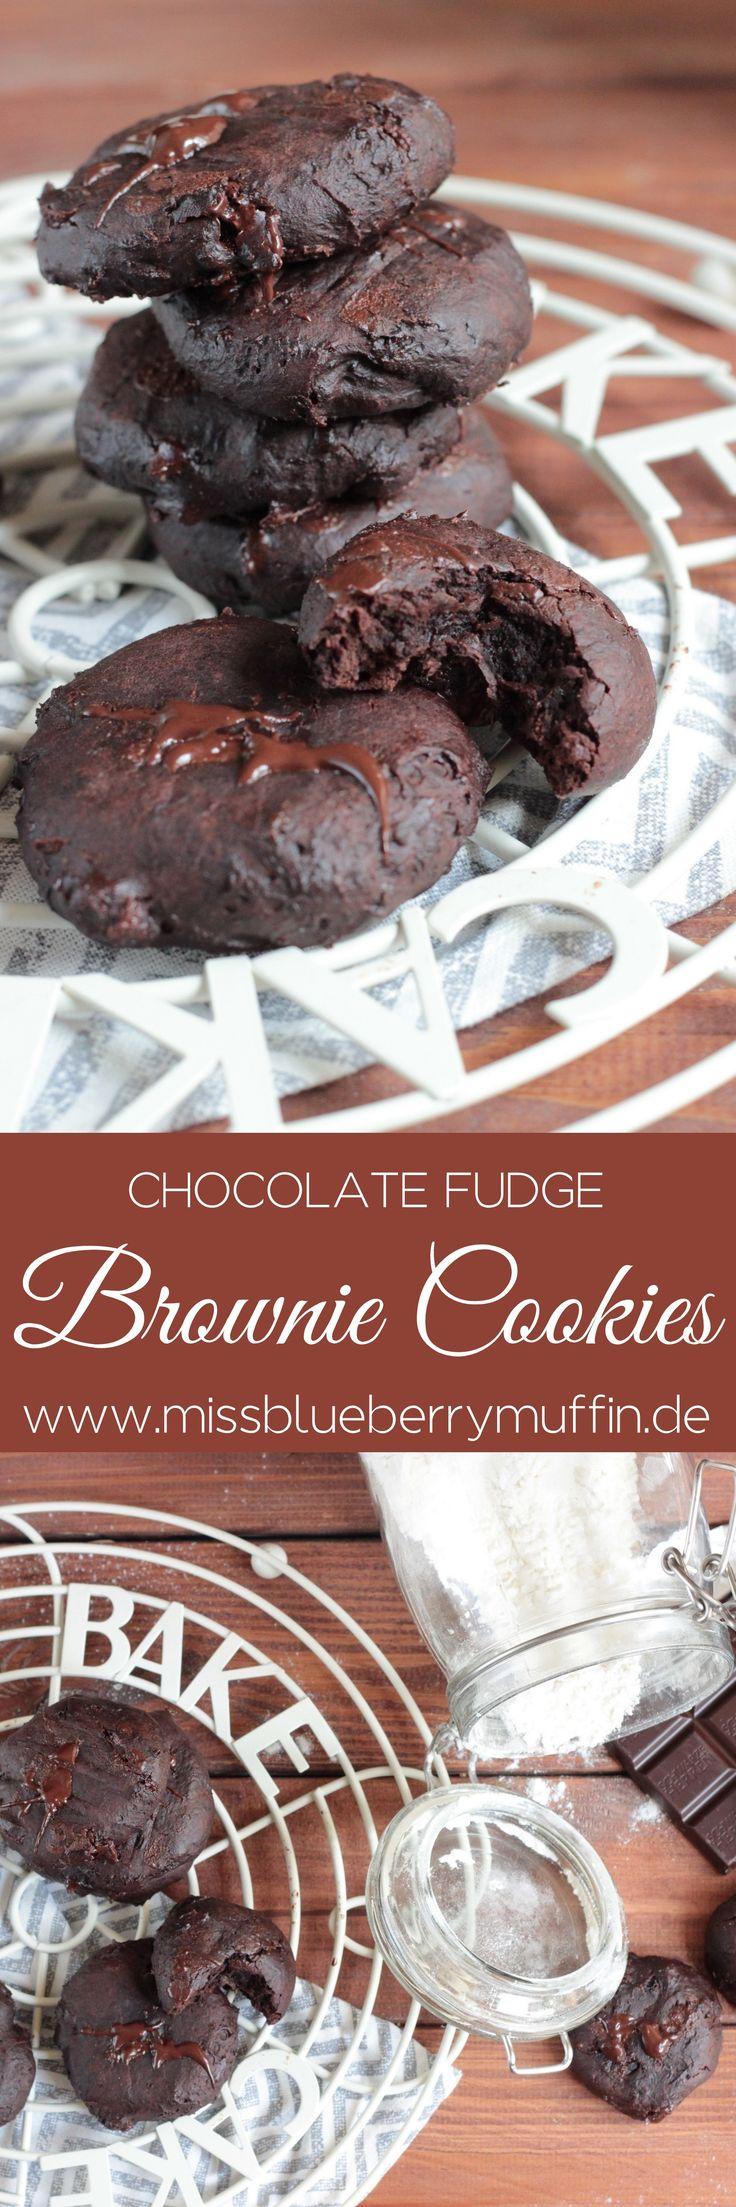 Die besten chocolate Fudge Brownie Cookies! Ich liebe diese Konsistenz! Mehr